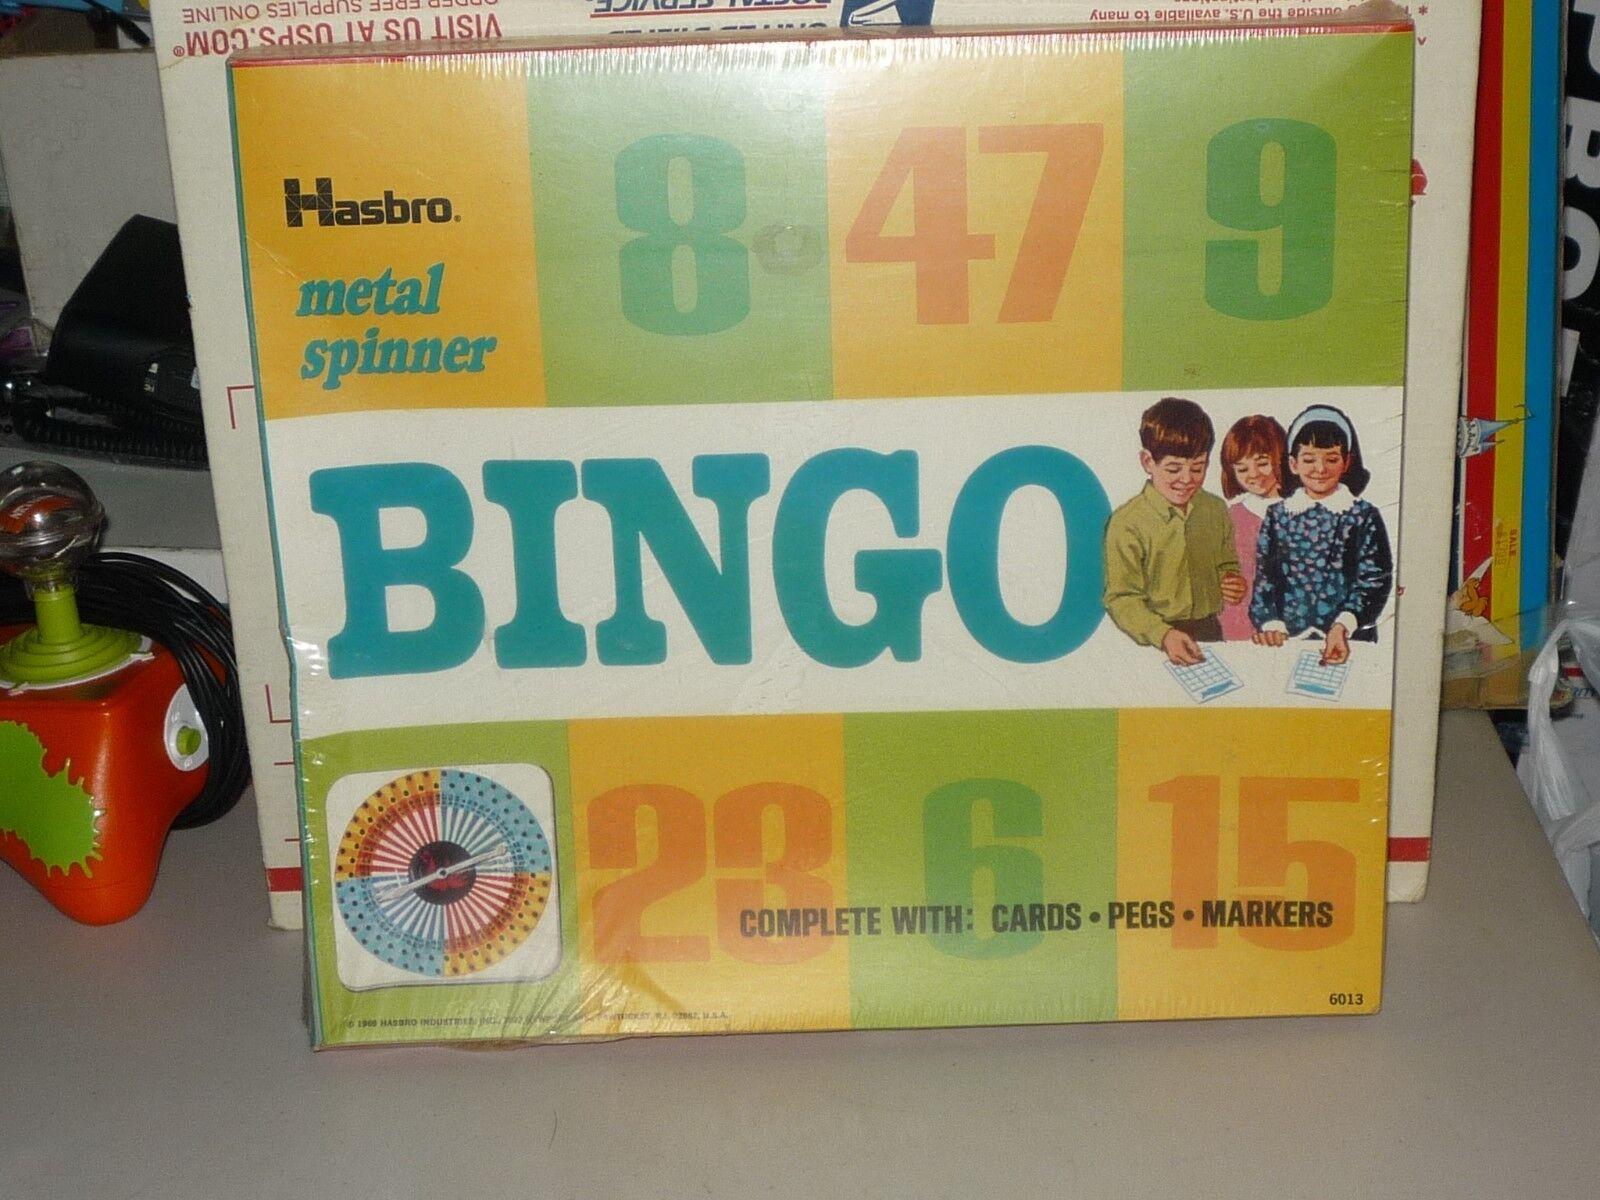 1969 vintage hasbro bingo spiel   6013 metall - - - spinner, fabrik versiegelt 43a37b